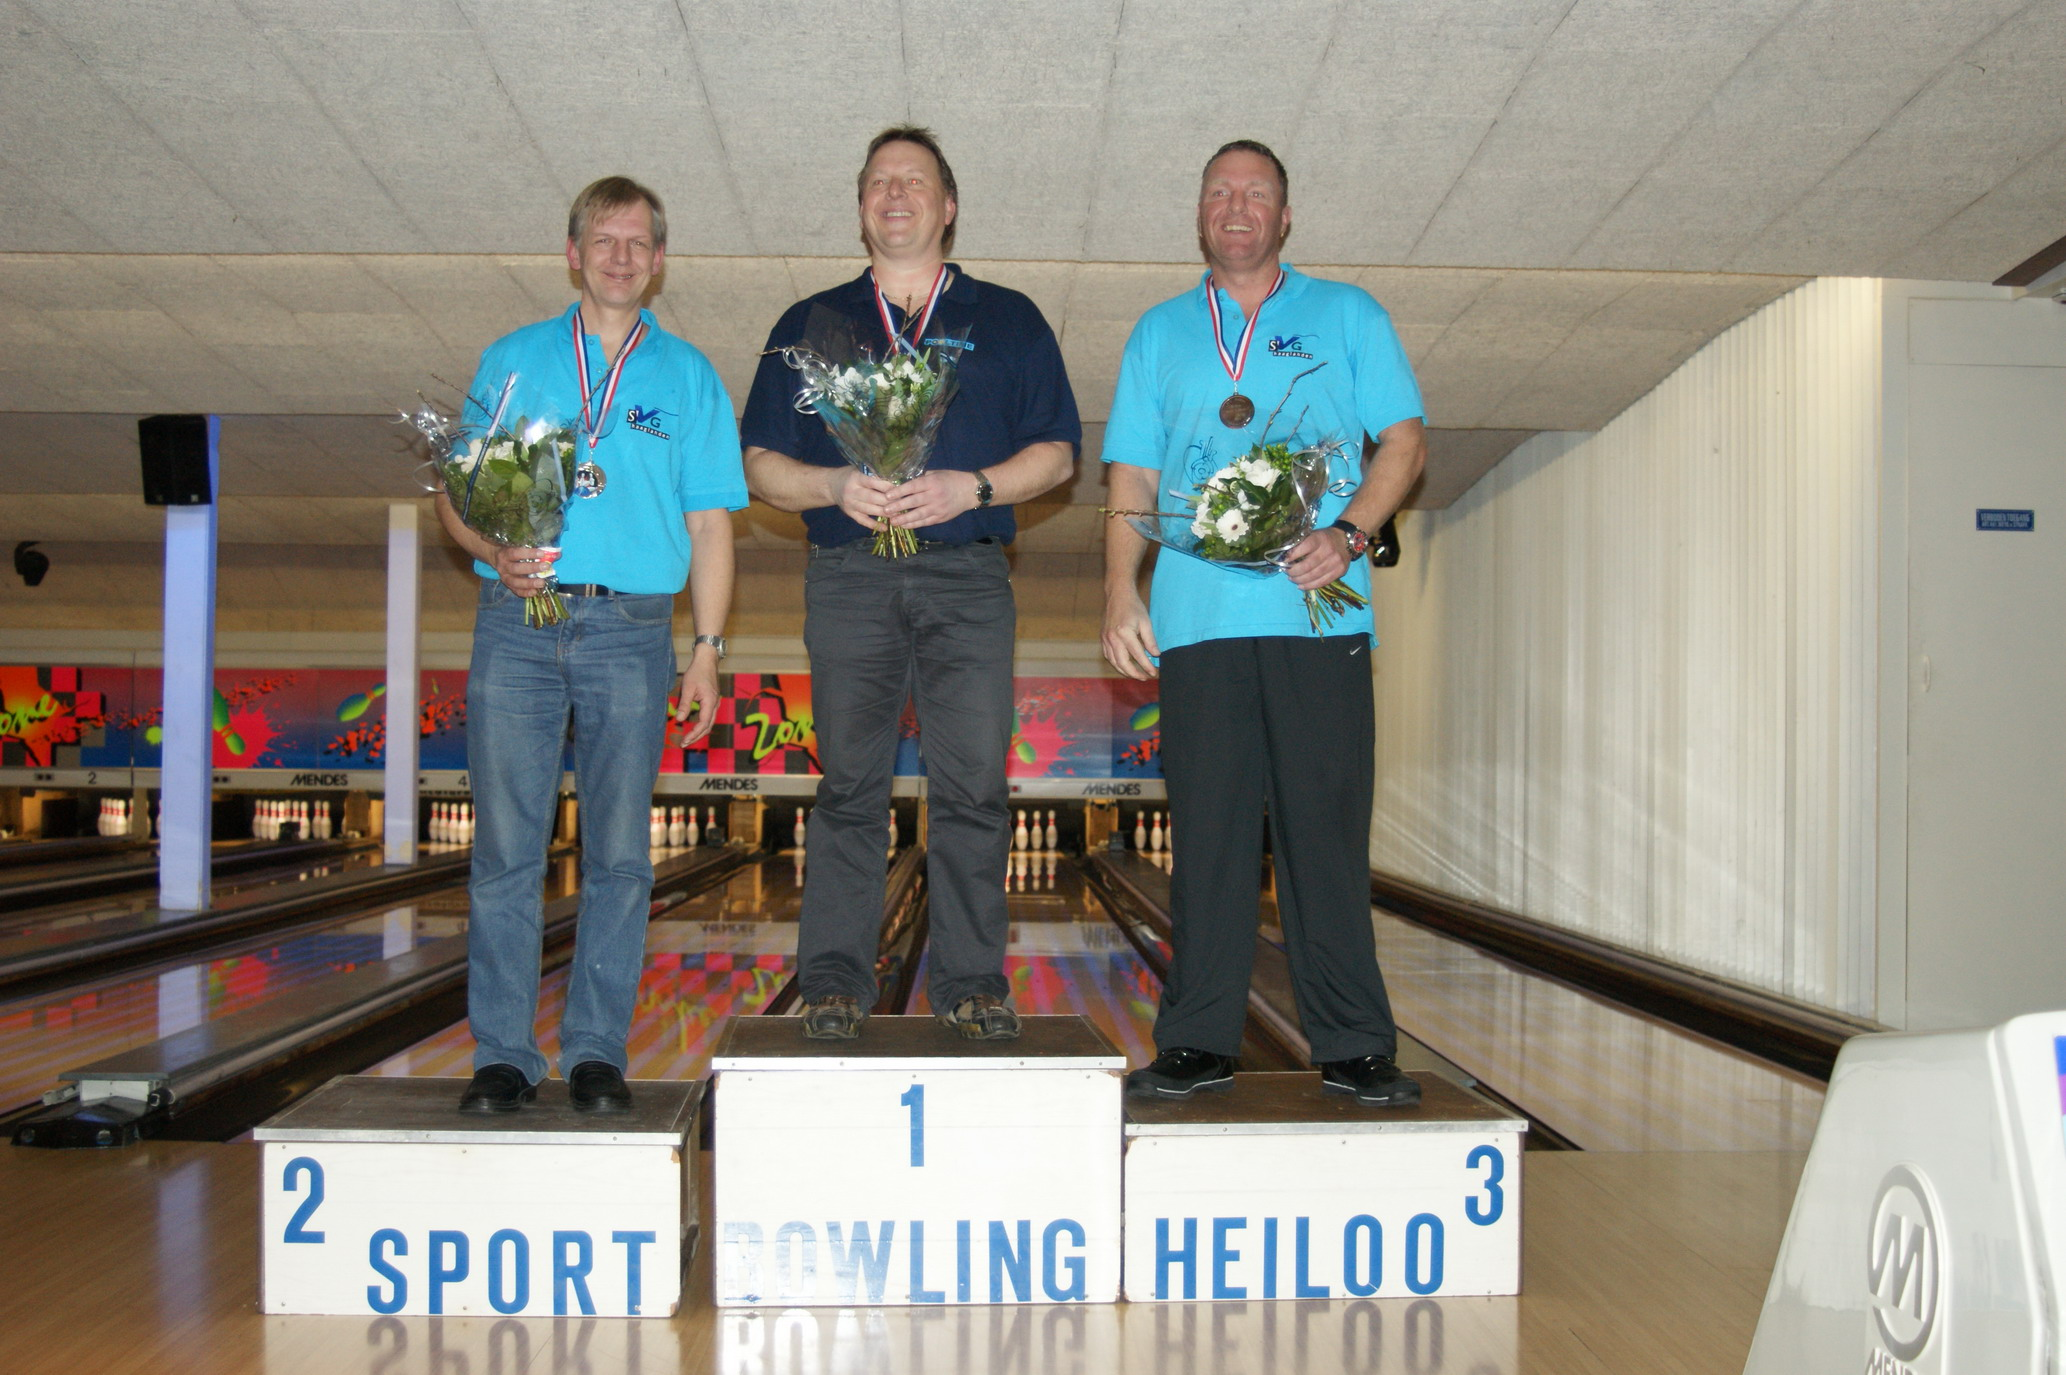 http://www.bowlingverenigingheiloo.nl/fotos_verhalen/foto's/2010_0204-Ver.kamp-Heren-AB.jpg